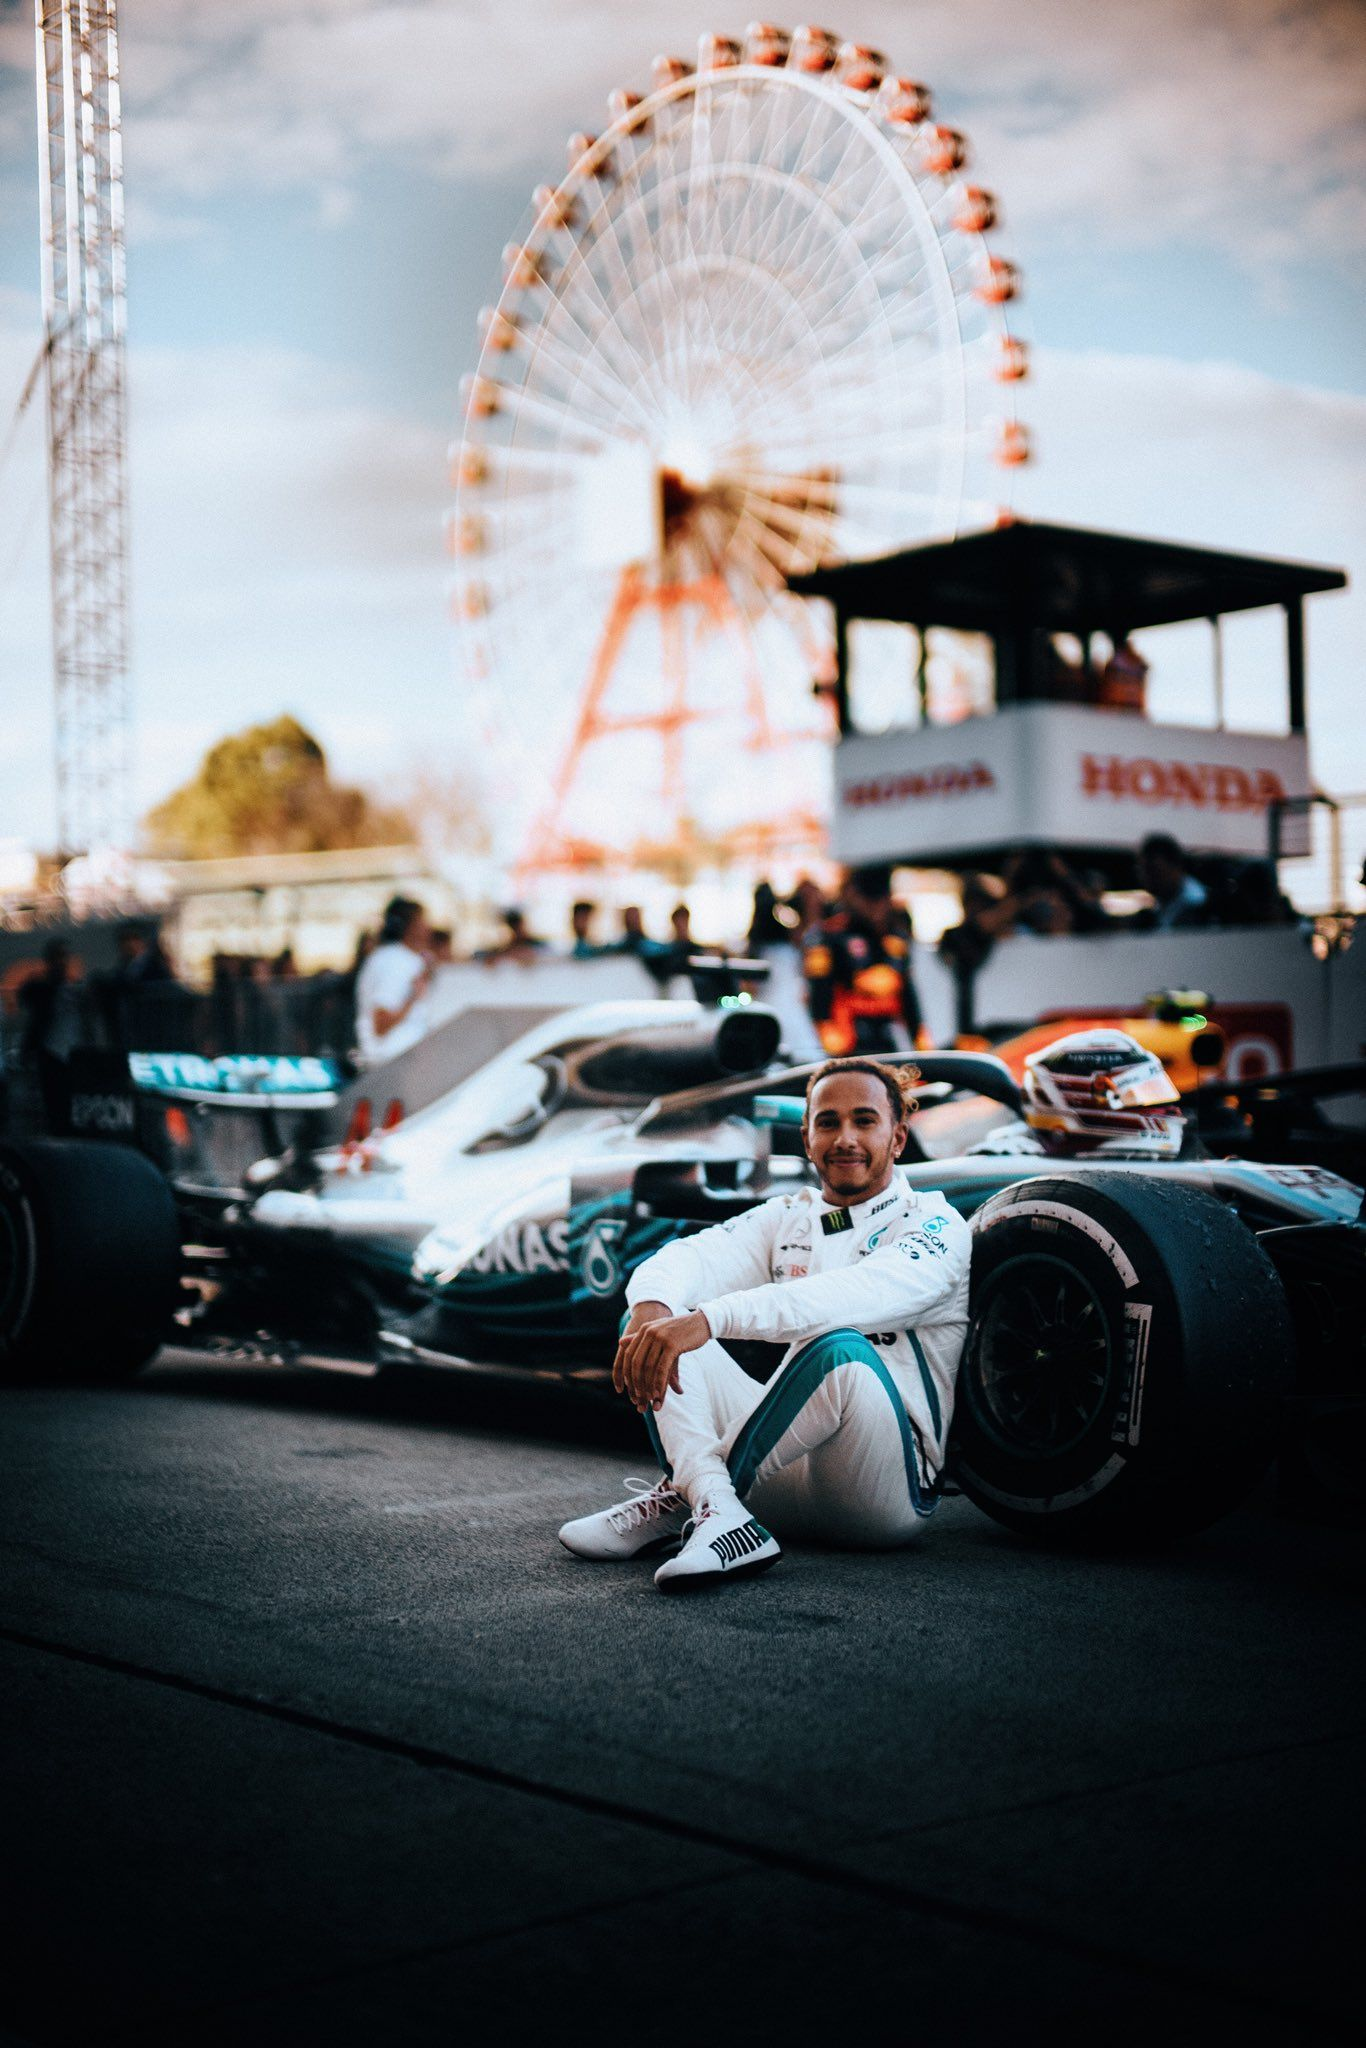 Mercedes Amg F1 On Twitter Lewis Hamilton Formula 1 F1 Lewis Hamilton Mercedes Amg